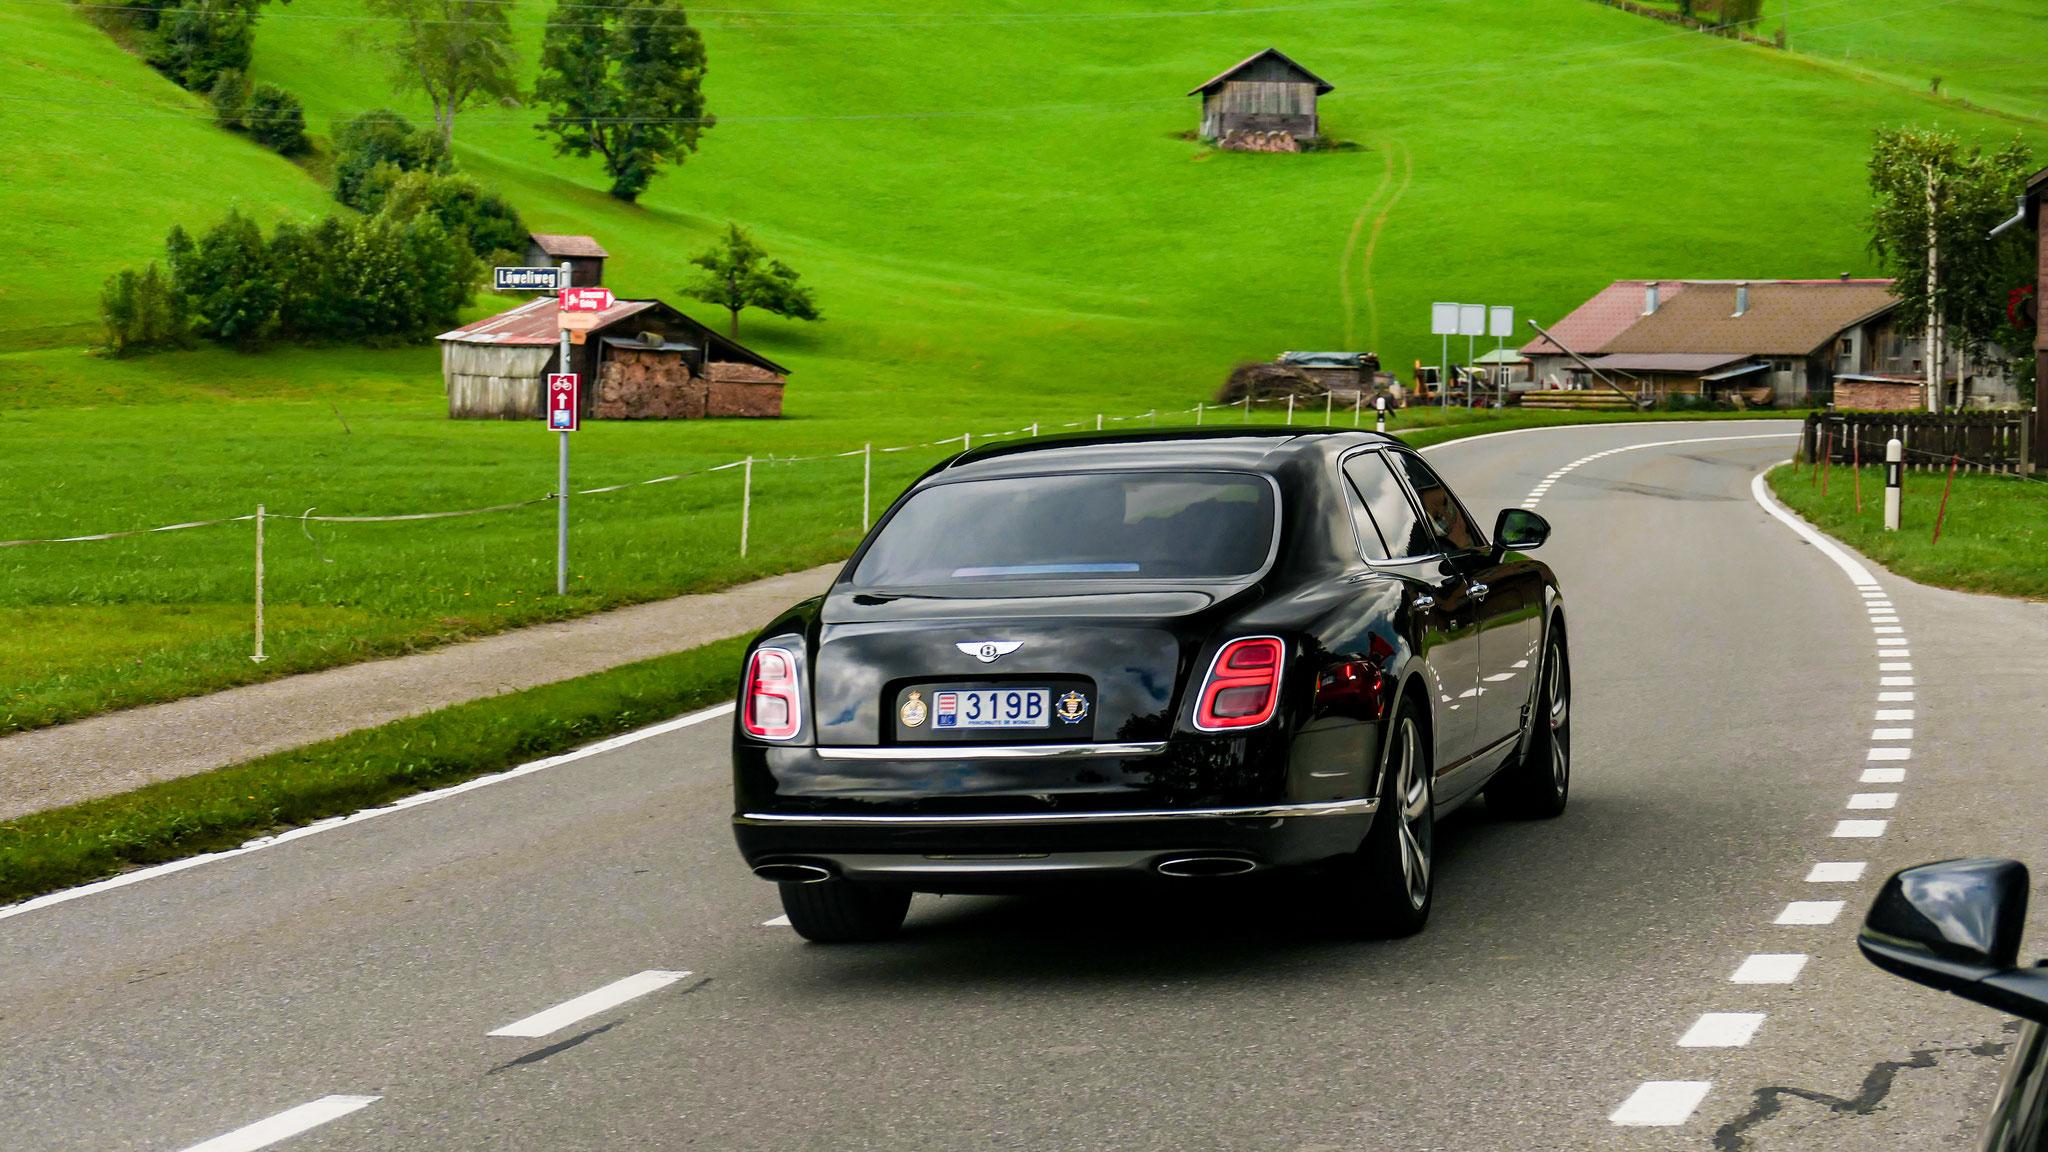 Bentley Mulsanne - 319B (MC)